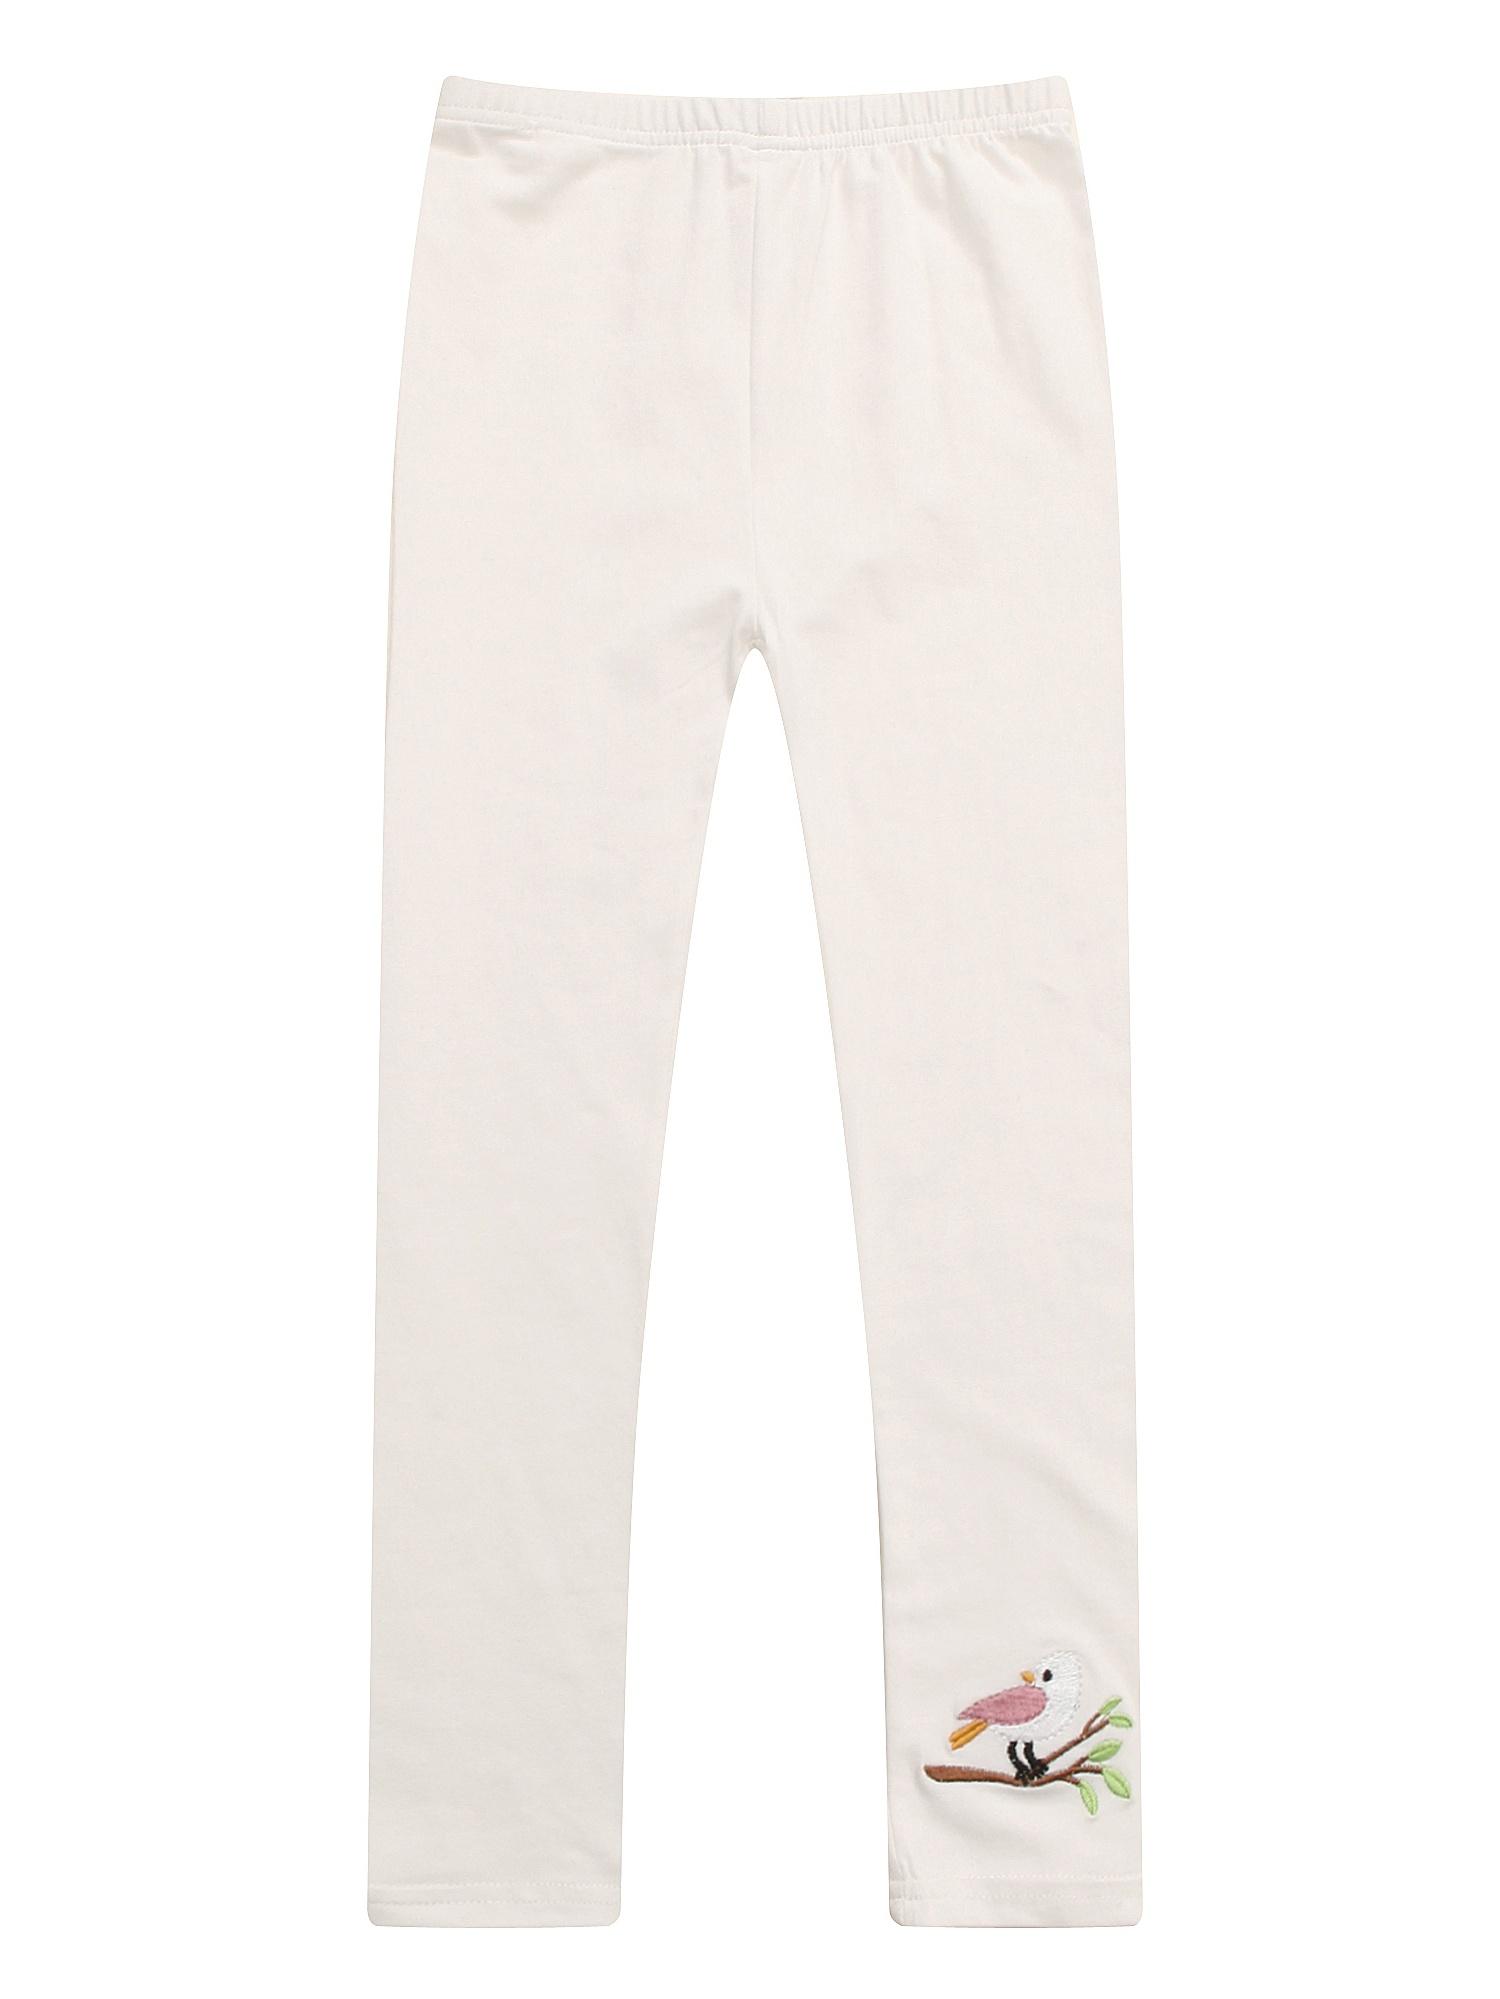 Richie House Girls' Girl Leggings With Embroidered Hem RH1872